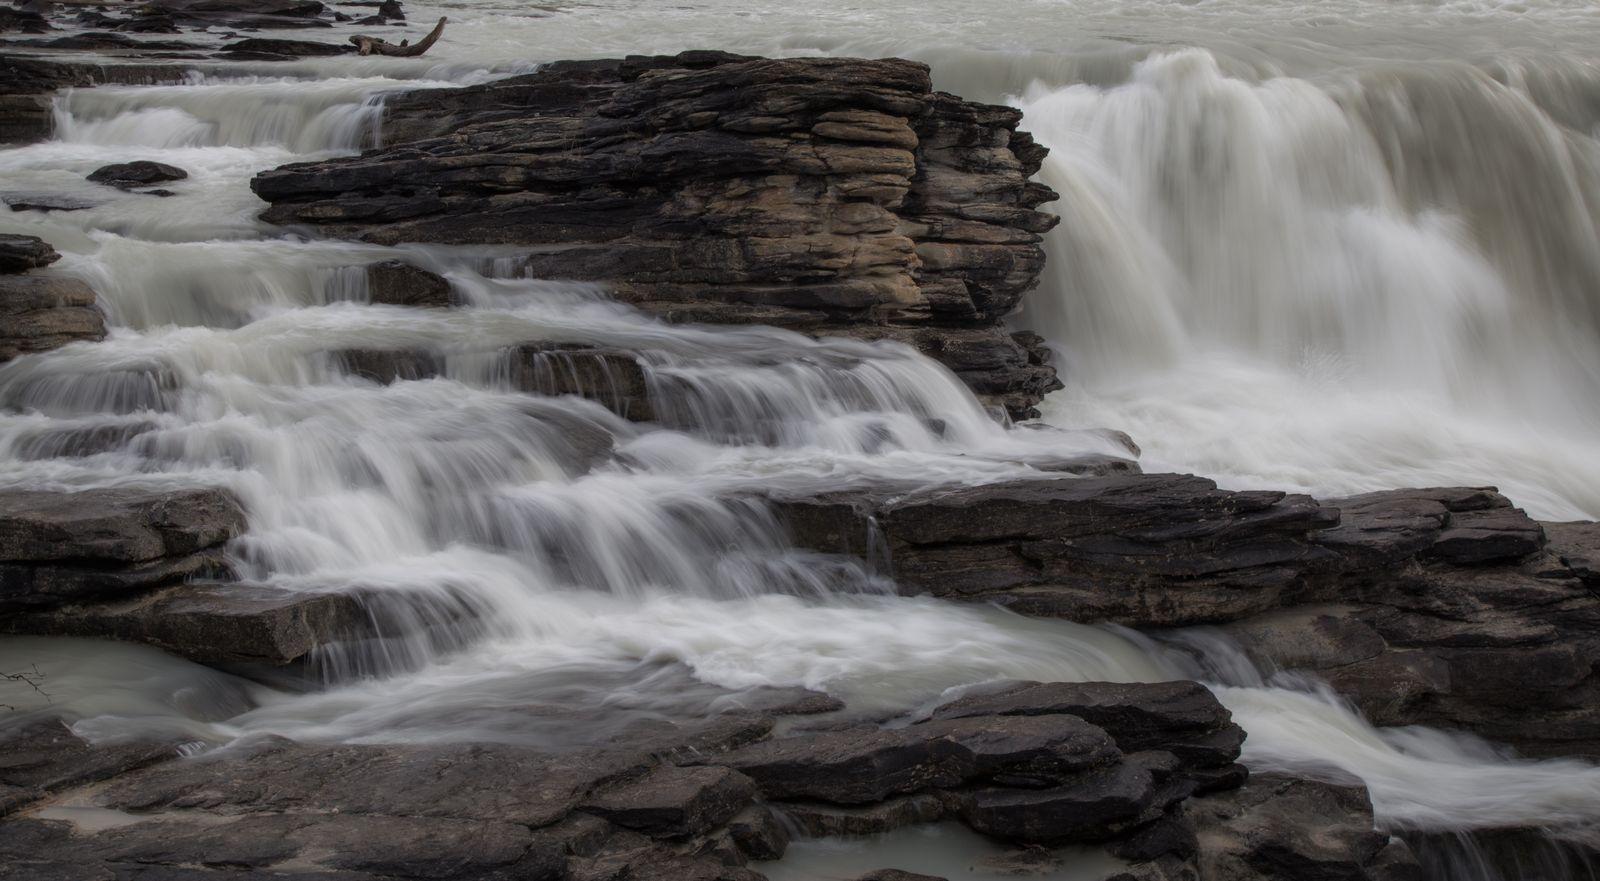 Detalle del agua de Athabasca